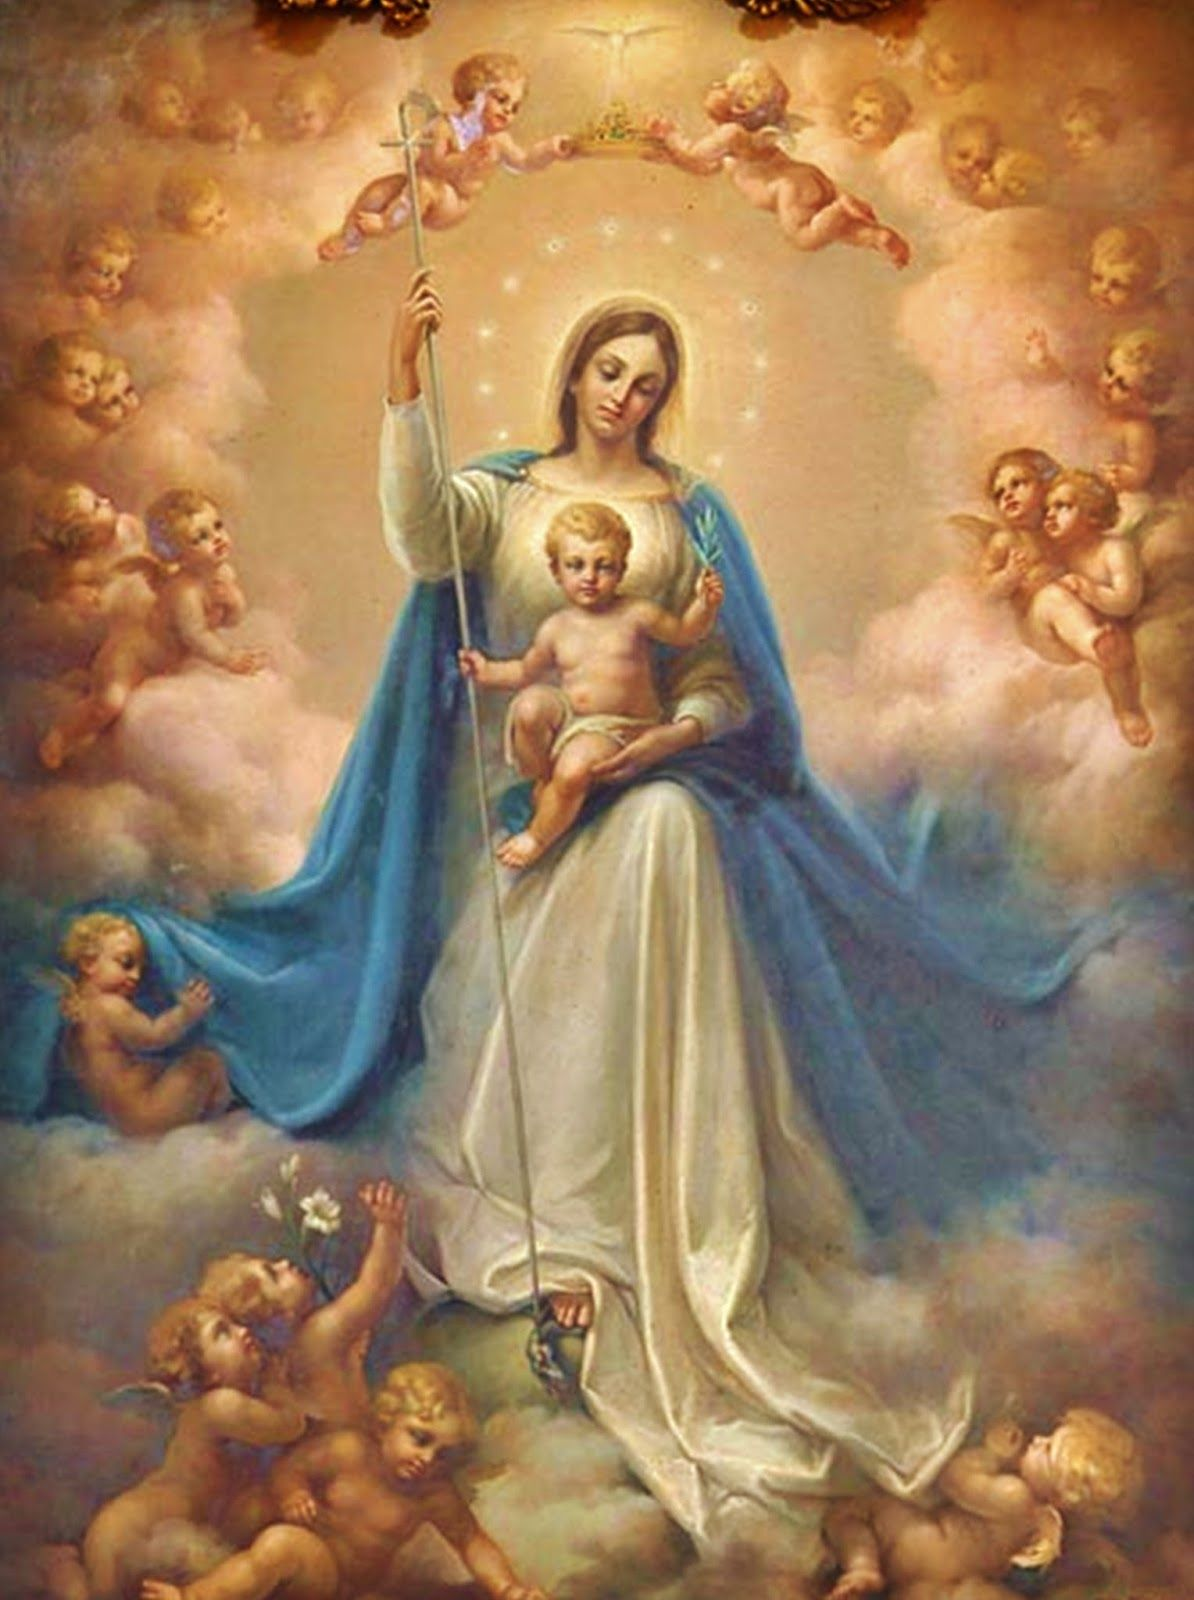 Virgin Mary Images Catholic 4.bp.blogspot.com -u-w...